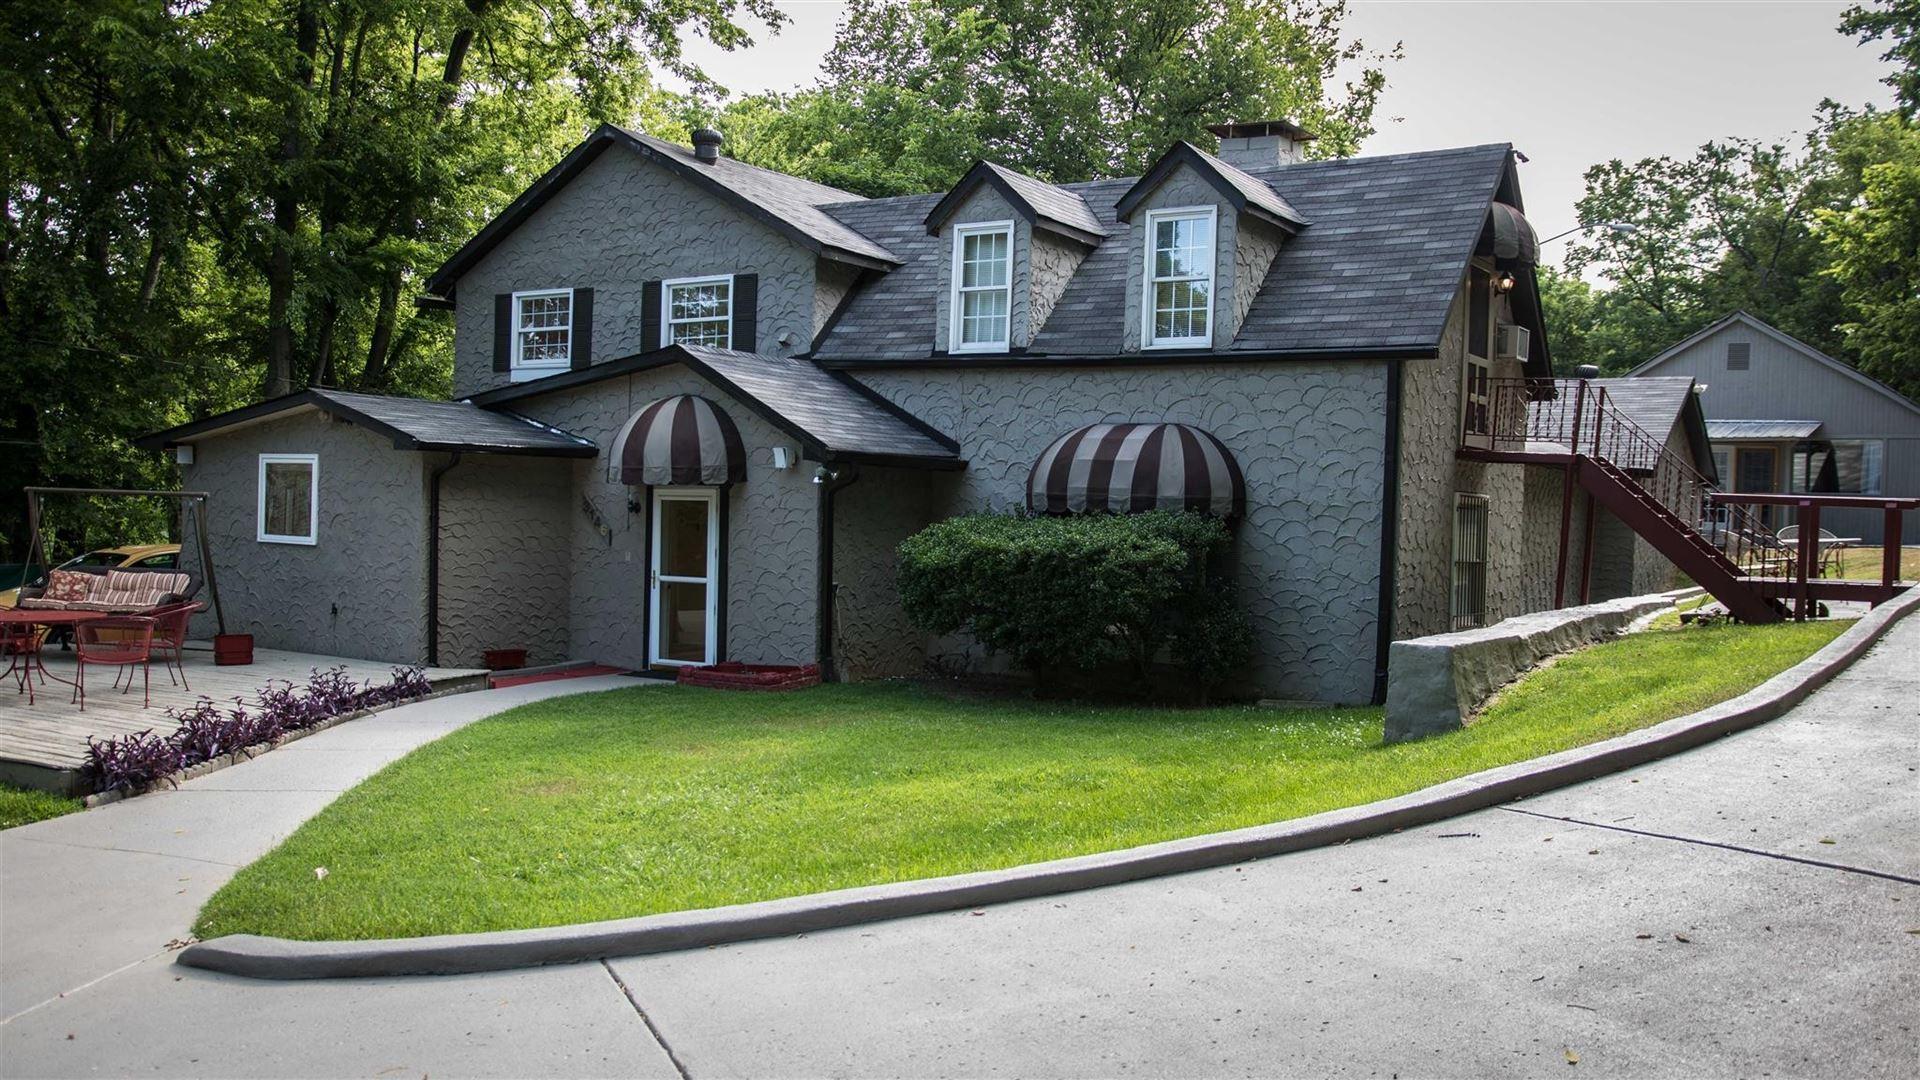 3146 Glencliff Rd, Nashville, TN 37211 - MLS#: 2233564